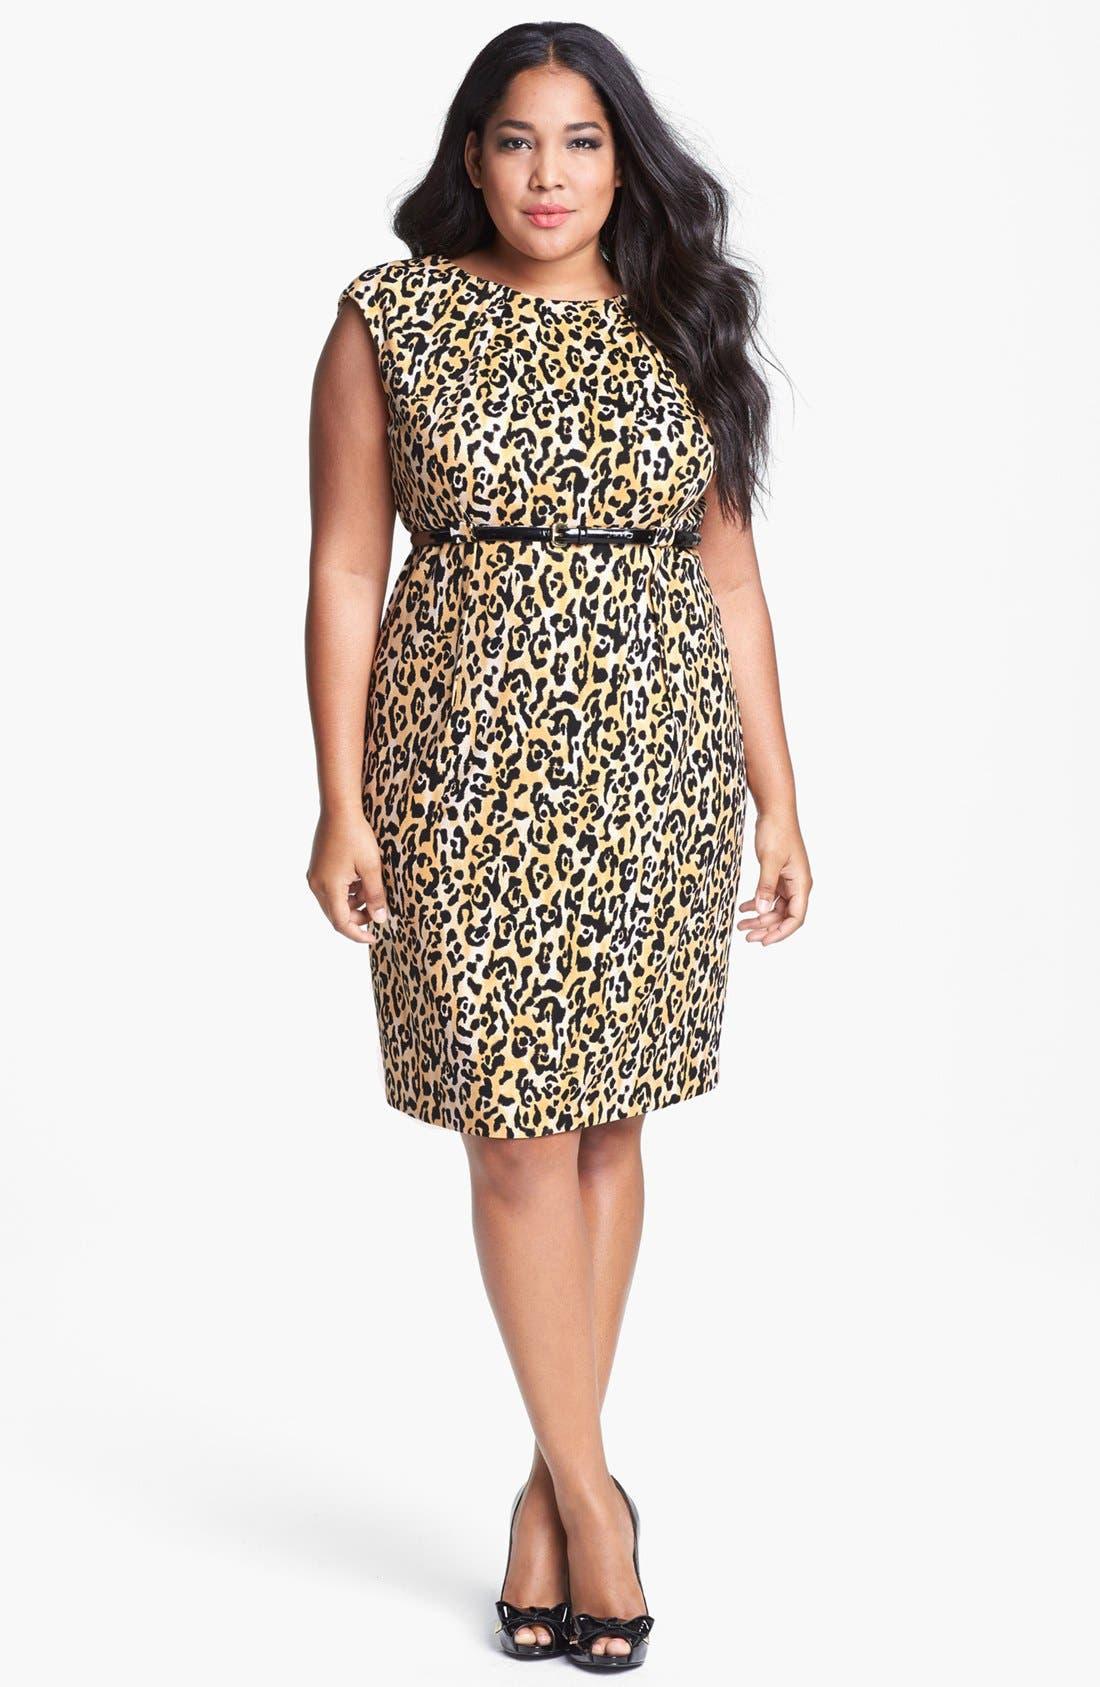 Alternate Image 1 Selected - Calvin Klein Print Ponte Knit Sheath Dress (Plus Size)